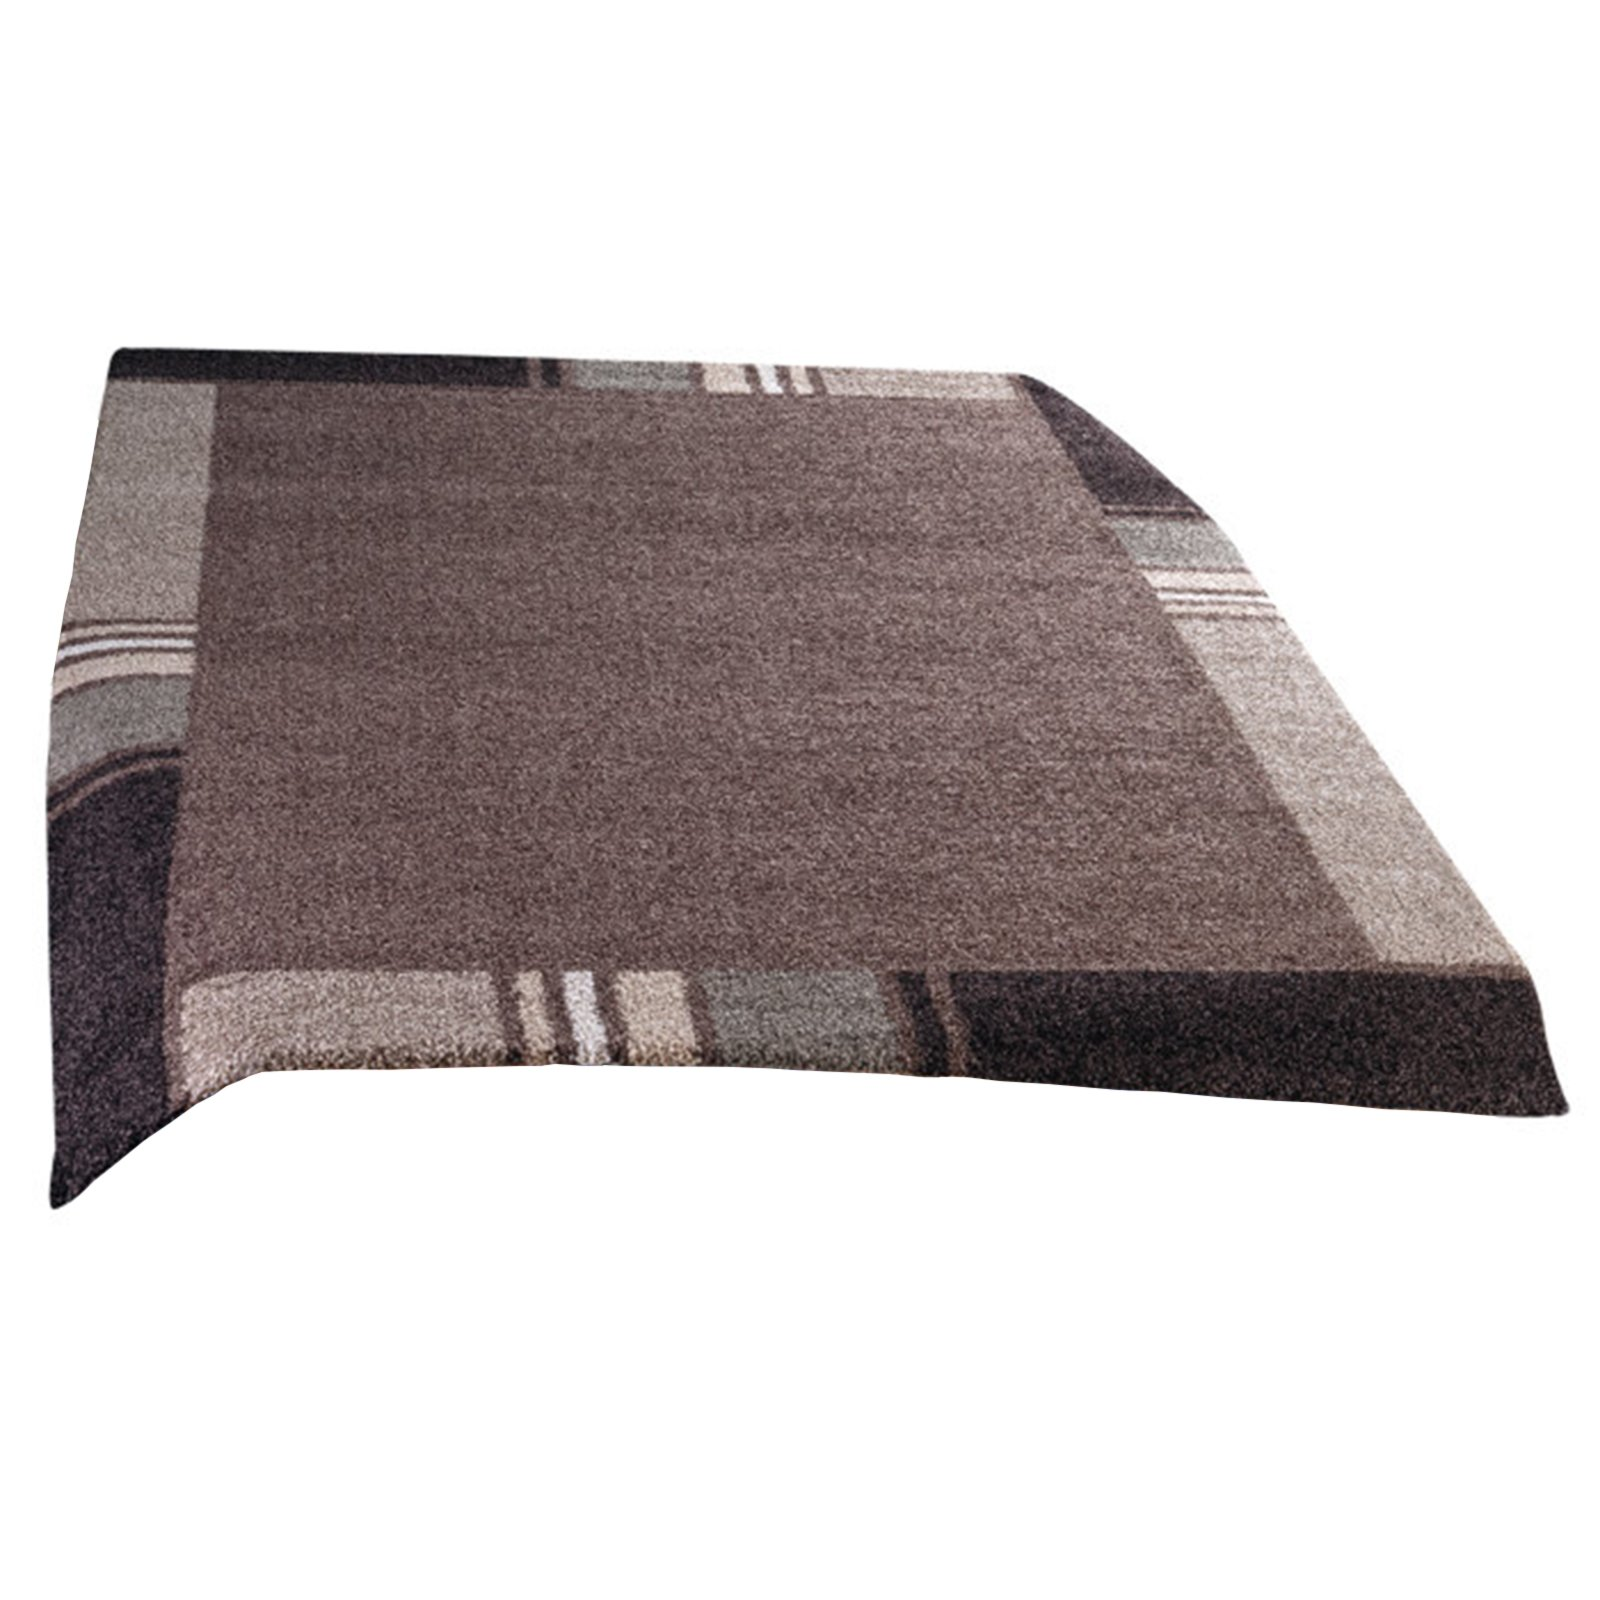 frisee teppich casa braun 60x115 cm gemusterte teppiche teppiche l ufer deko. Black Bedroom Furniture Sets. Home Design Ideas